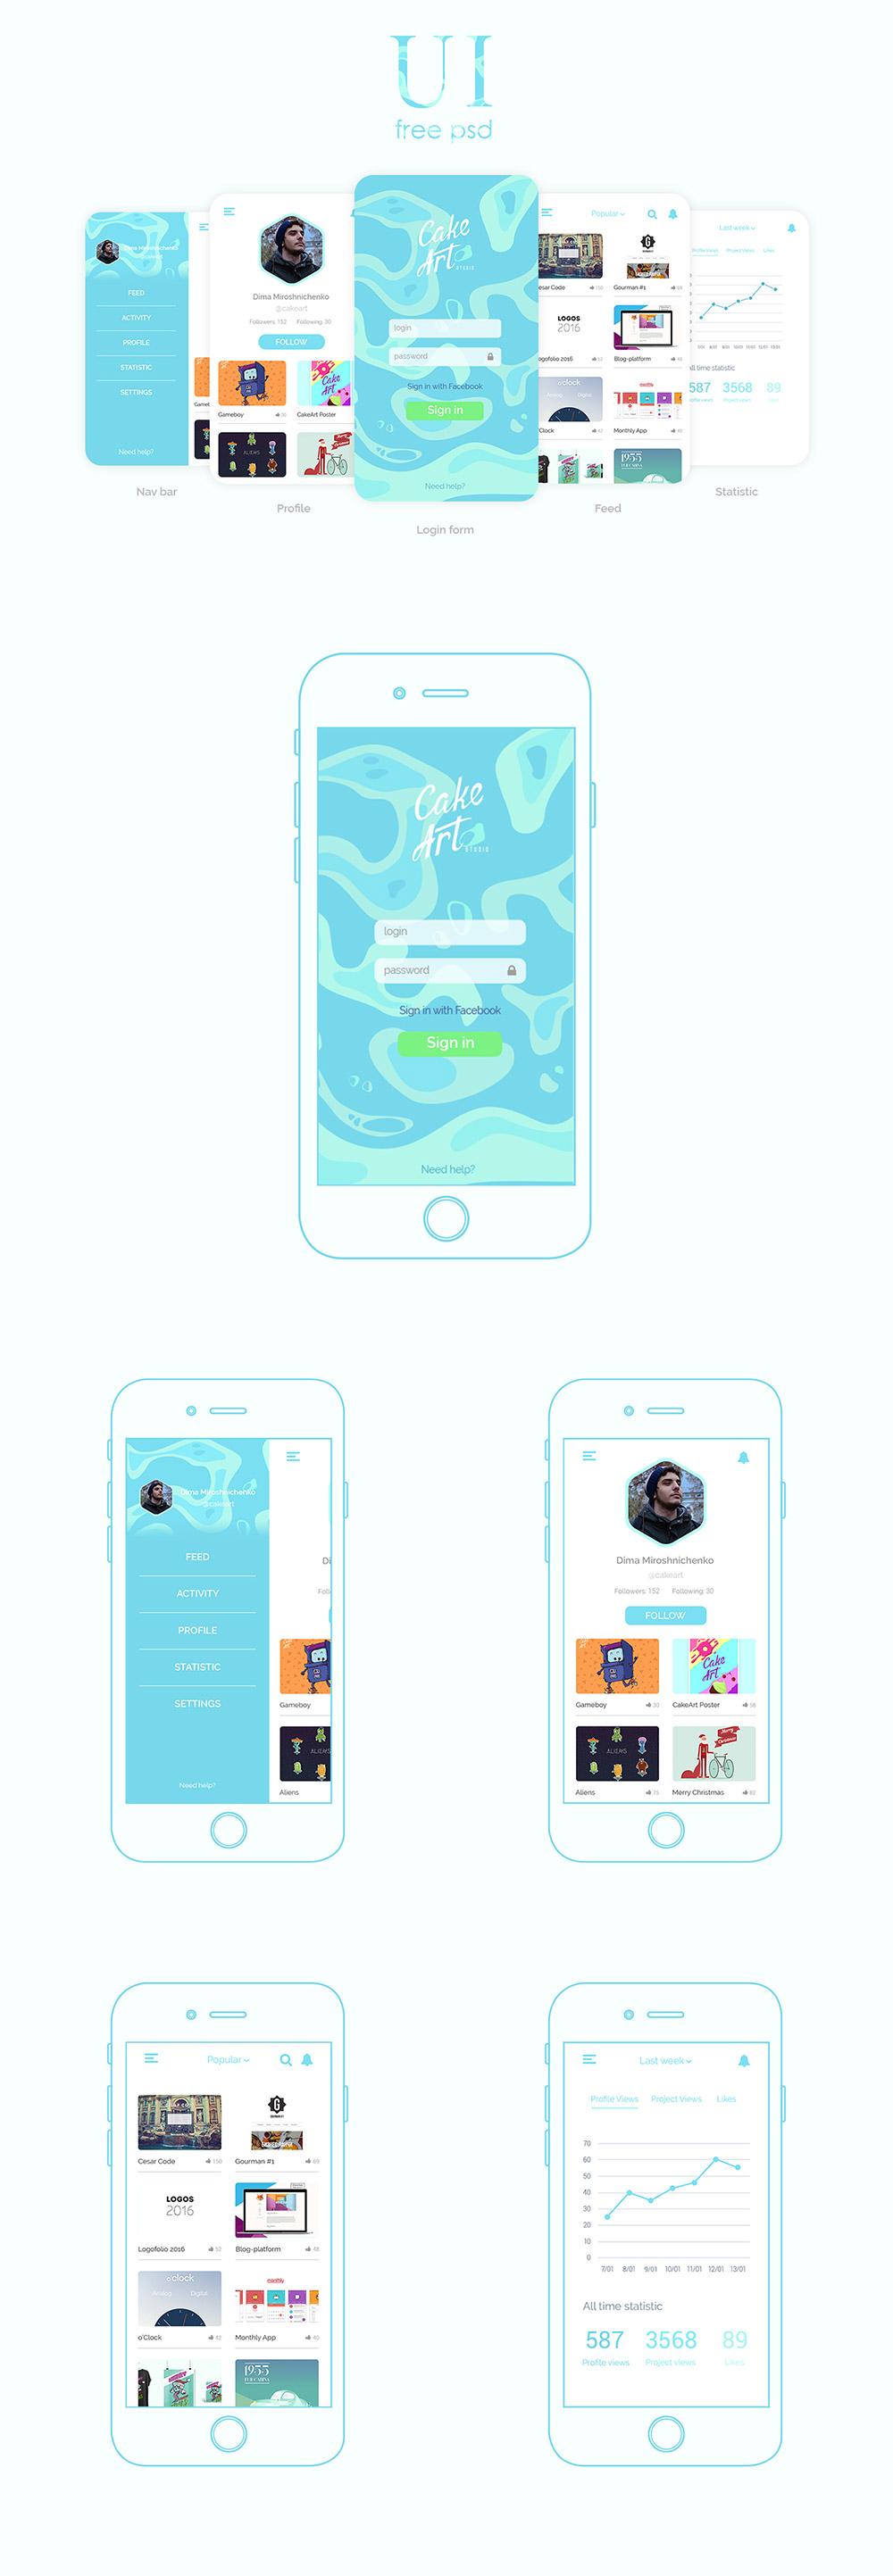 Elegant Social Mobile App Design Templates Free PSD